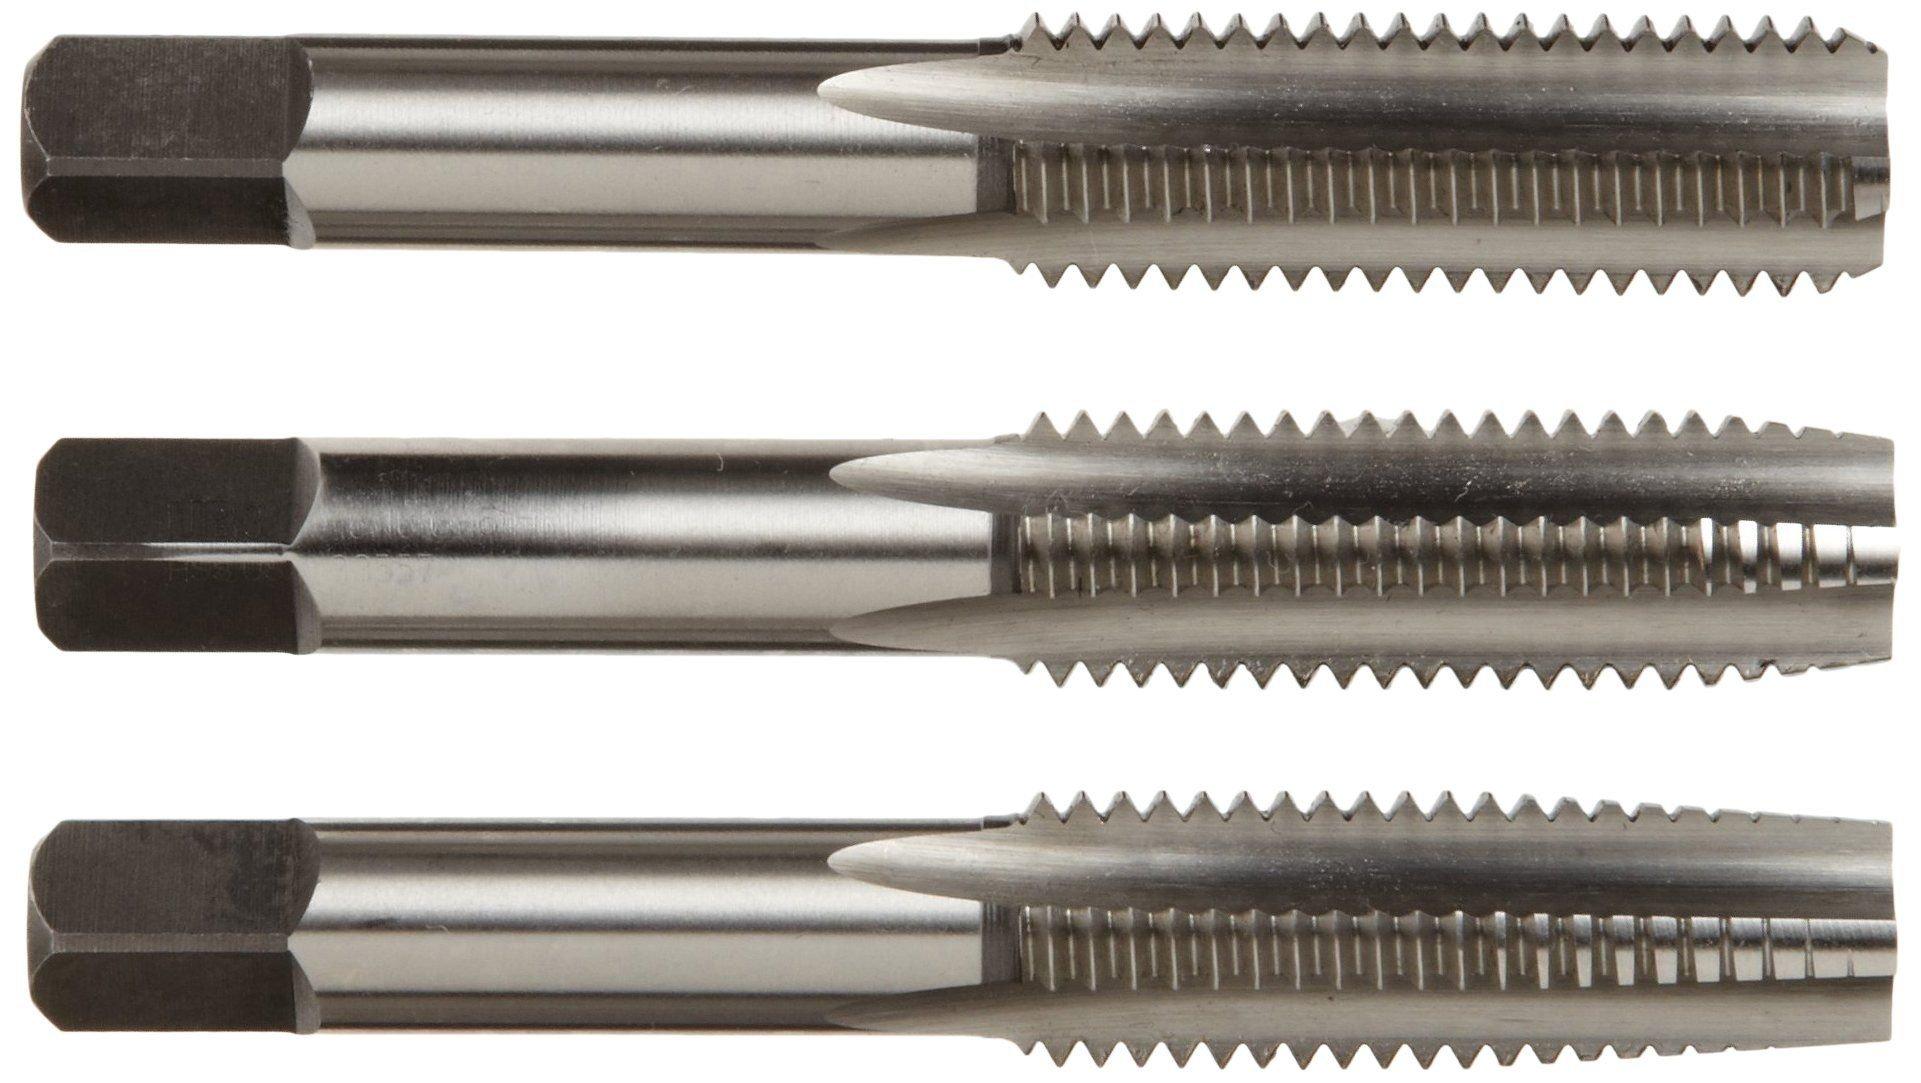 Alfa Tools CSHTS70532 1/4-20 Carbon Steel Hand Tap Set Taper/Plug/Bottom by Alfa Tools (Image #1)